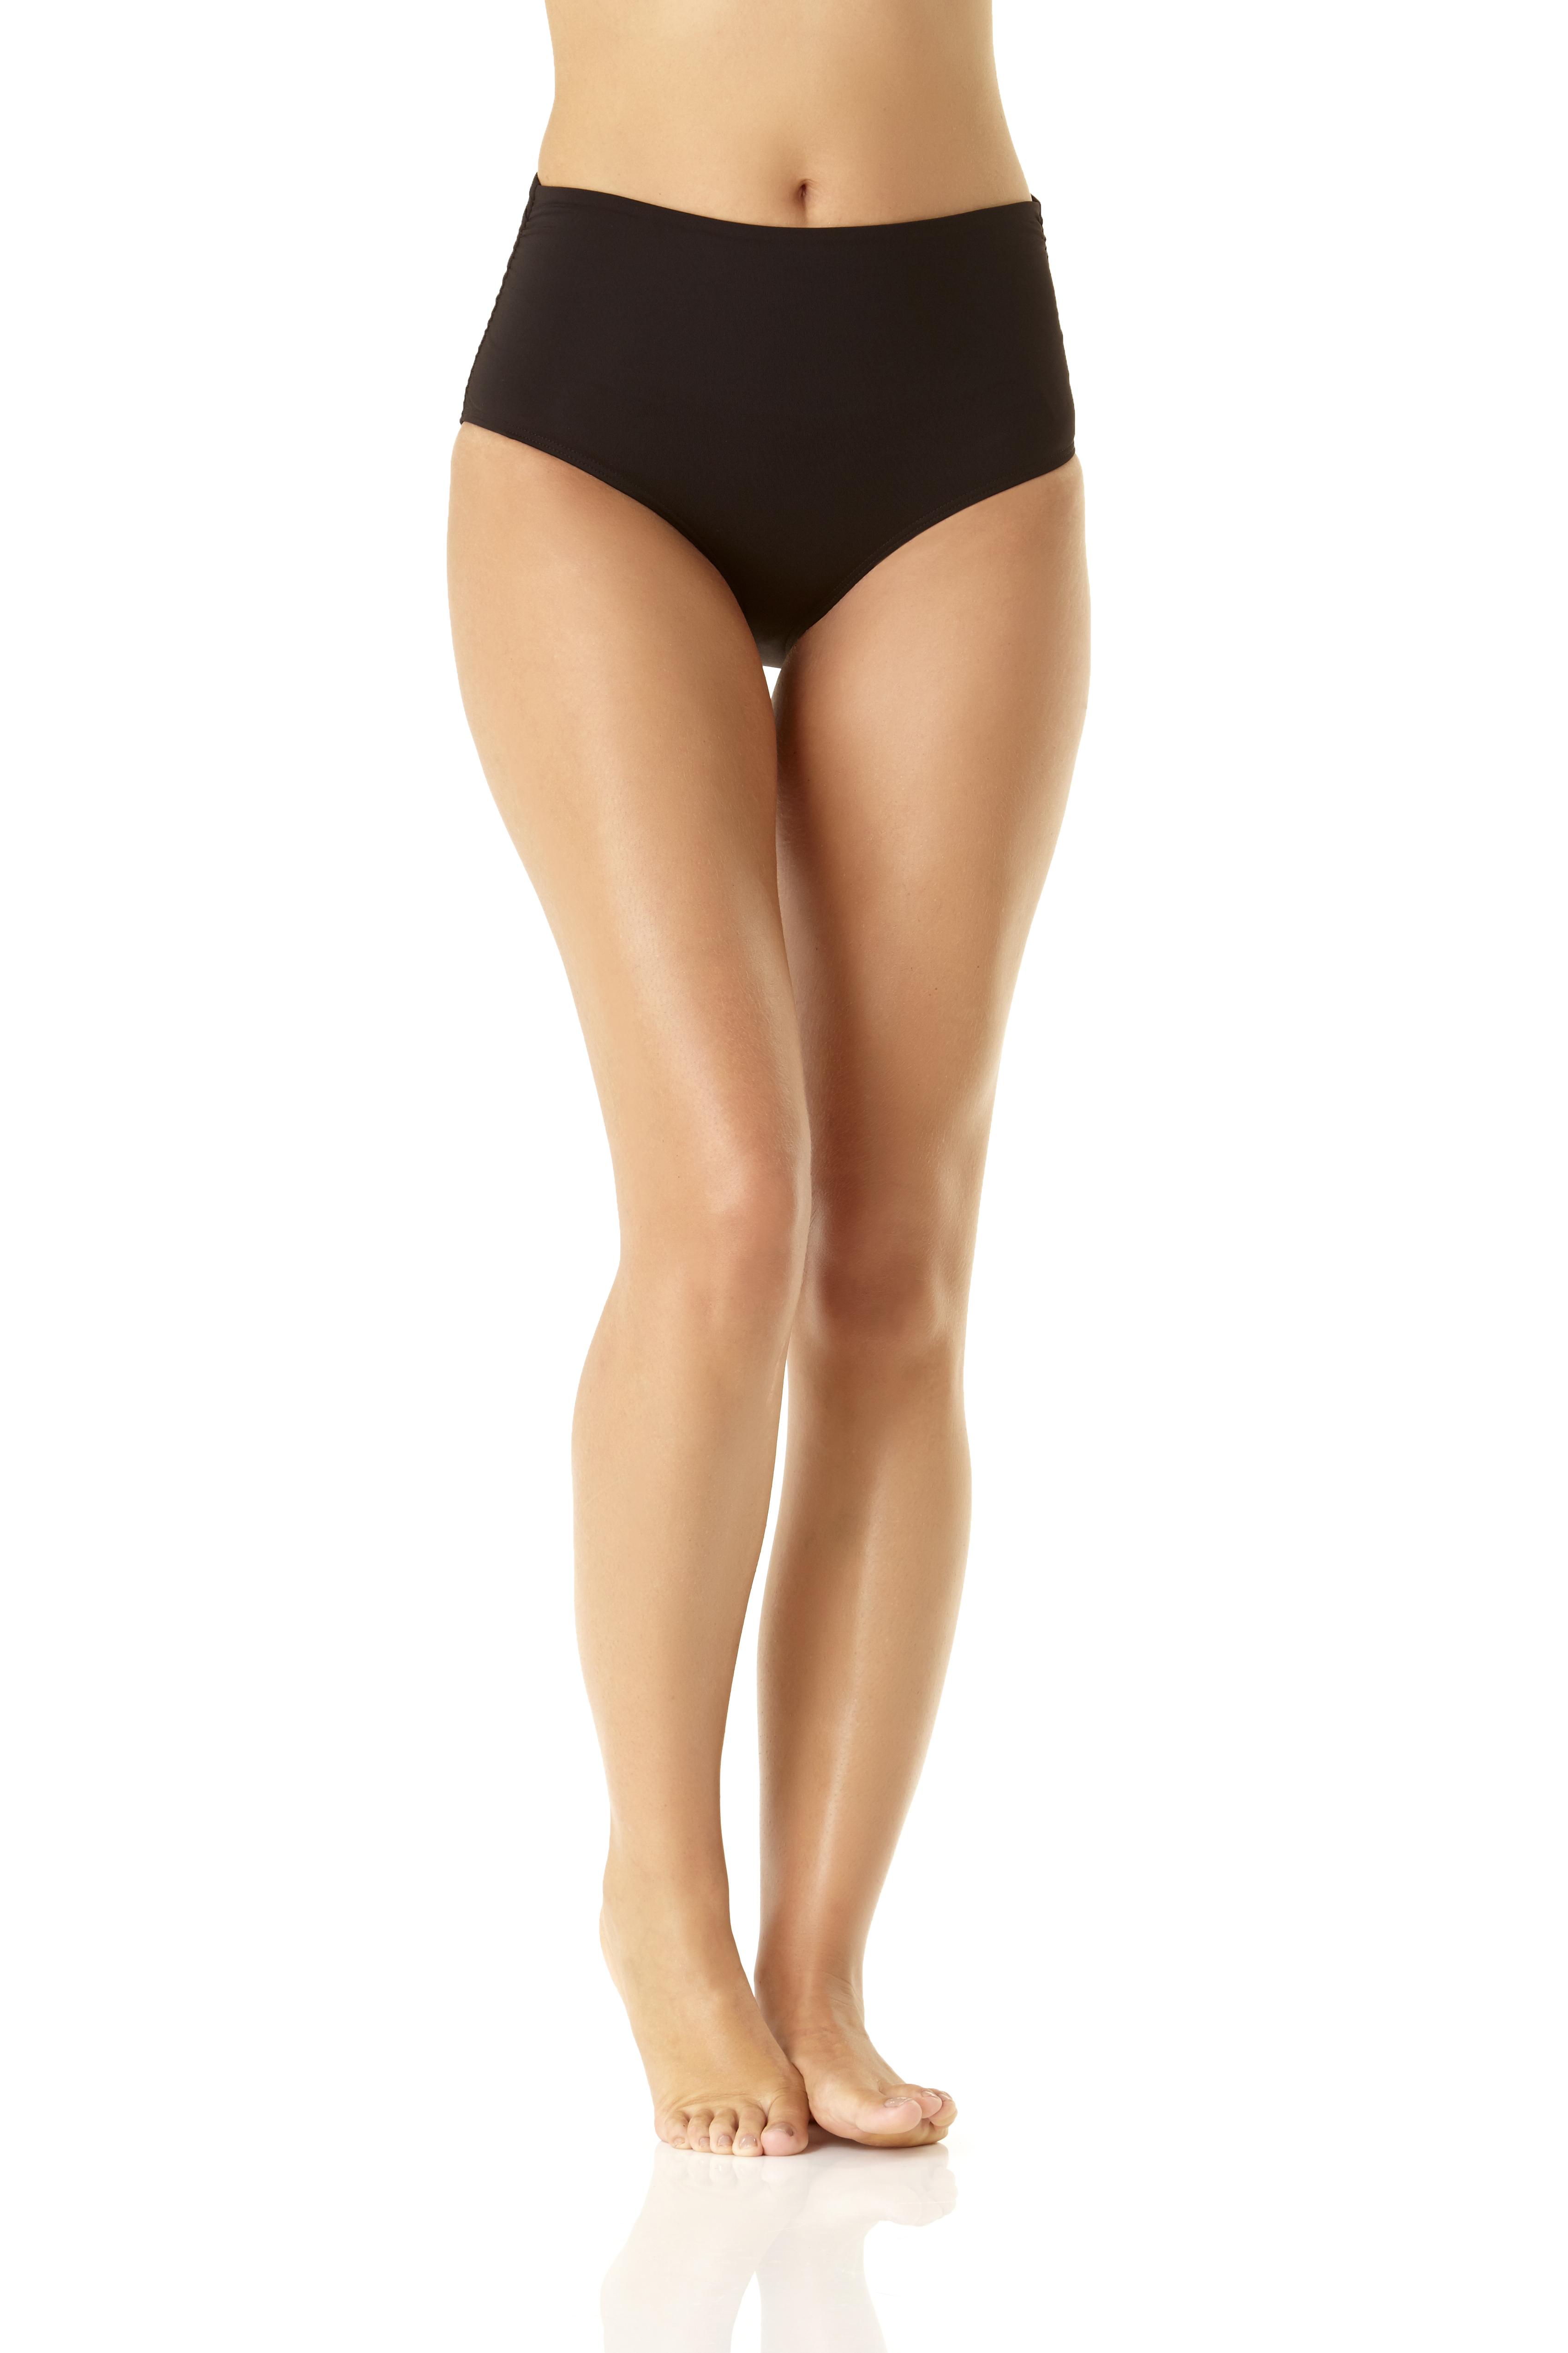 Anne Cole® Live in Color Hi Waist Shirred Bikini Swimsuit Bottom -Black - Front